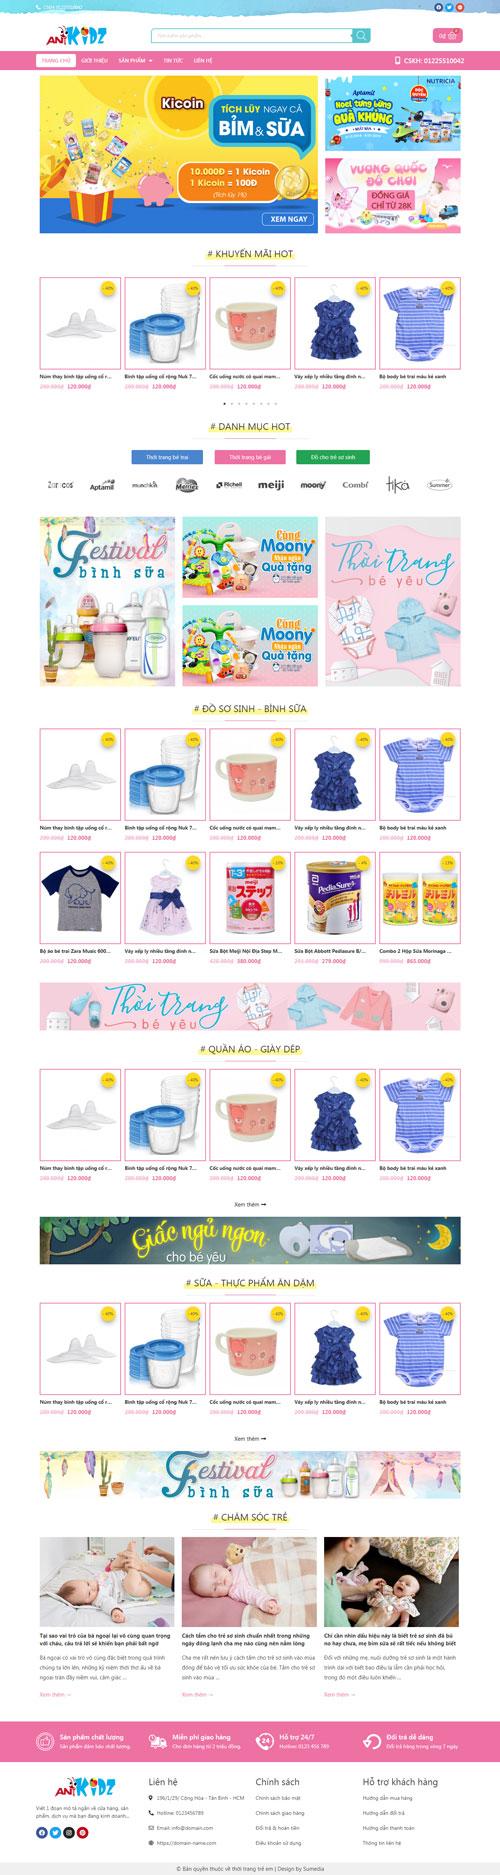 Website bán thời trang trẻ em 1